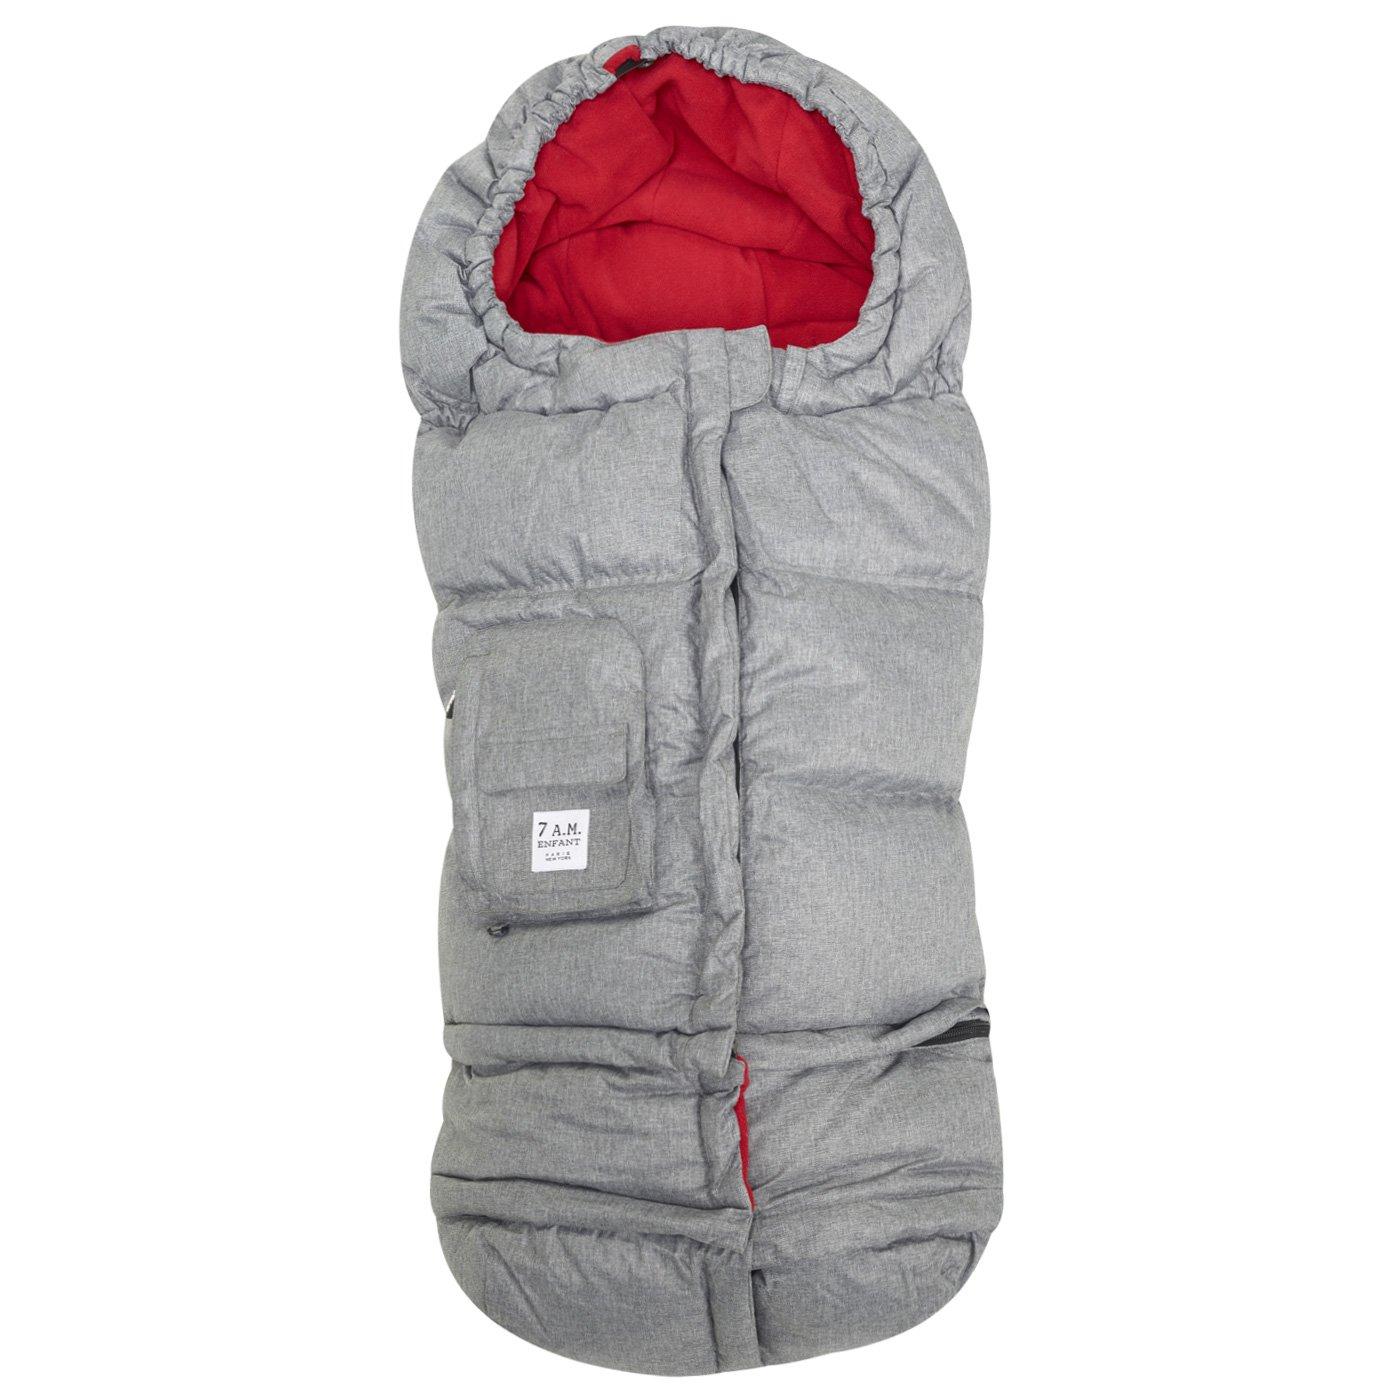 7 A.M. Enfant Blanket 212 Evolution Footmuff-Heather Grey with Red Fleece Lining